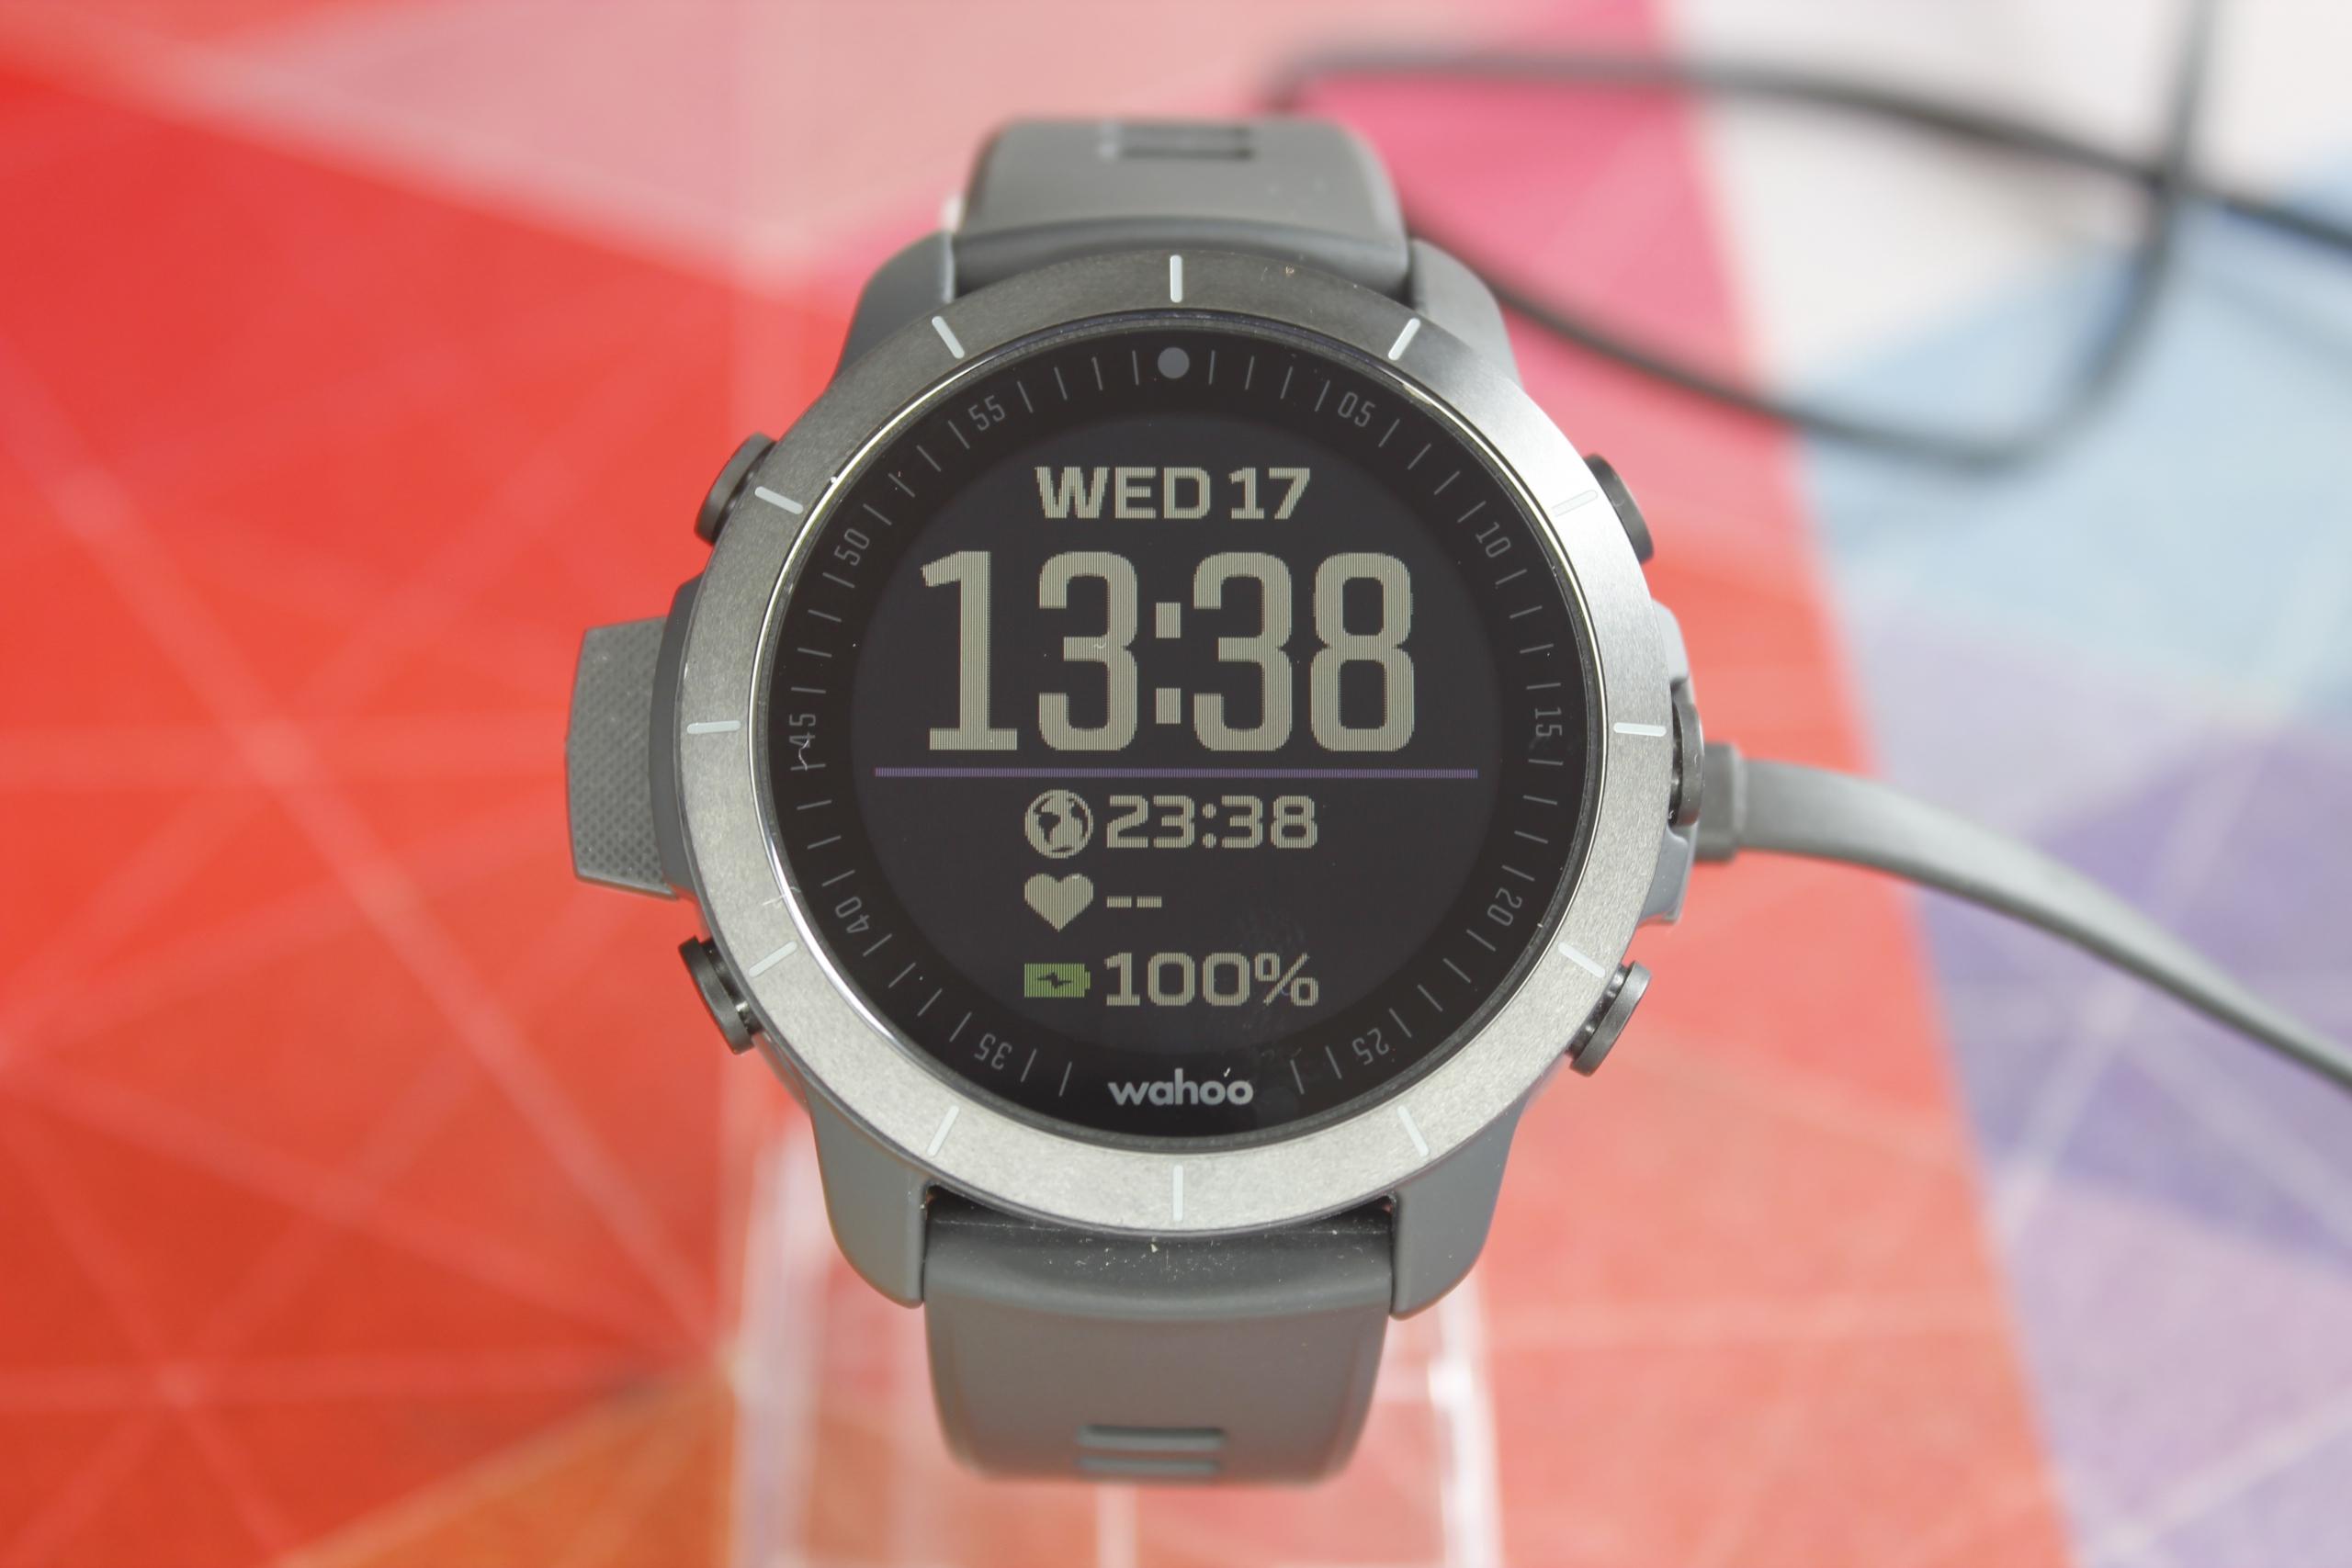 Wahoo-Rival-Watchface-Utility-Digital